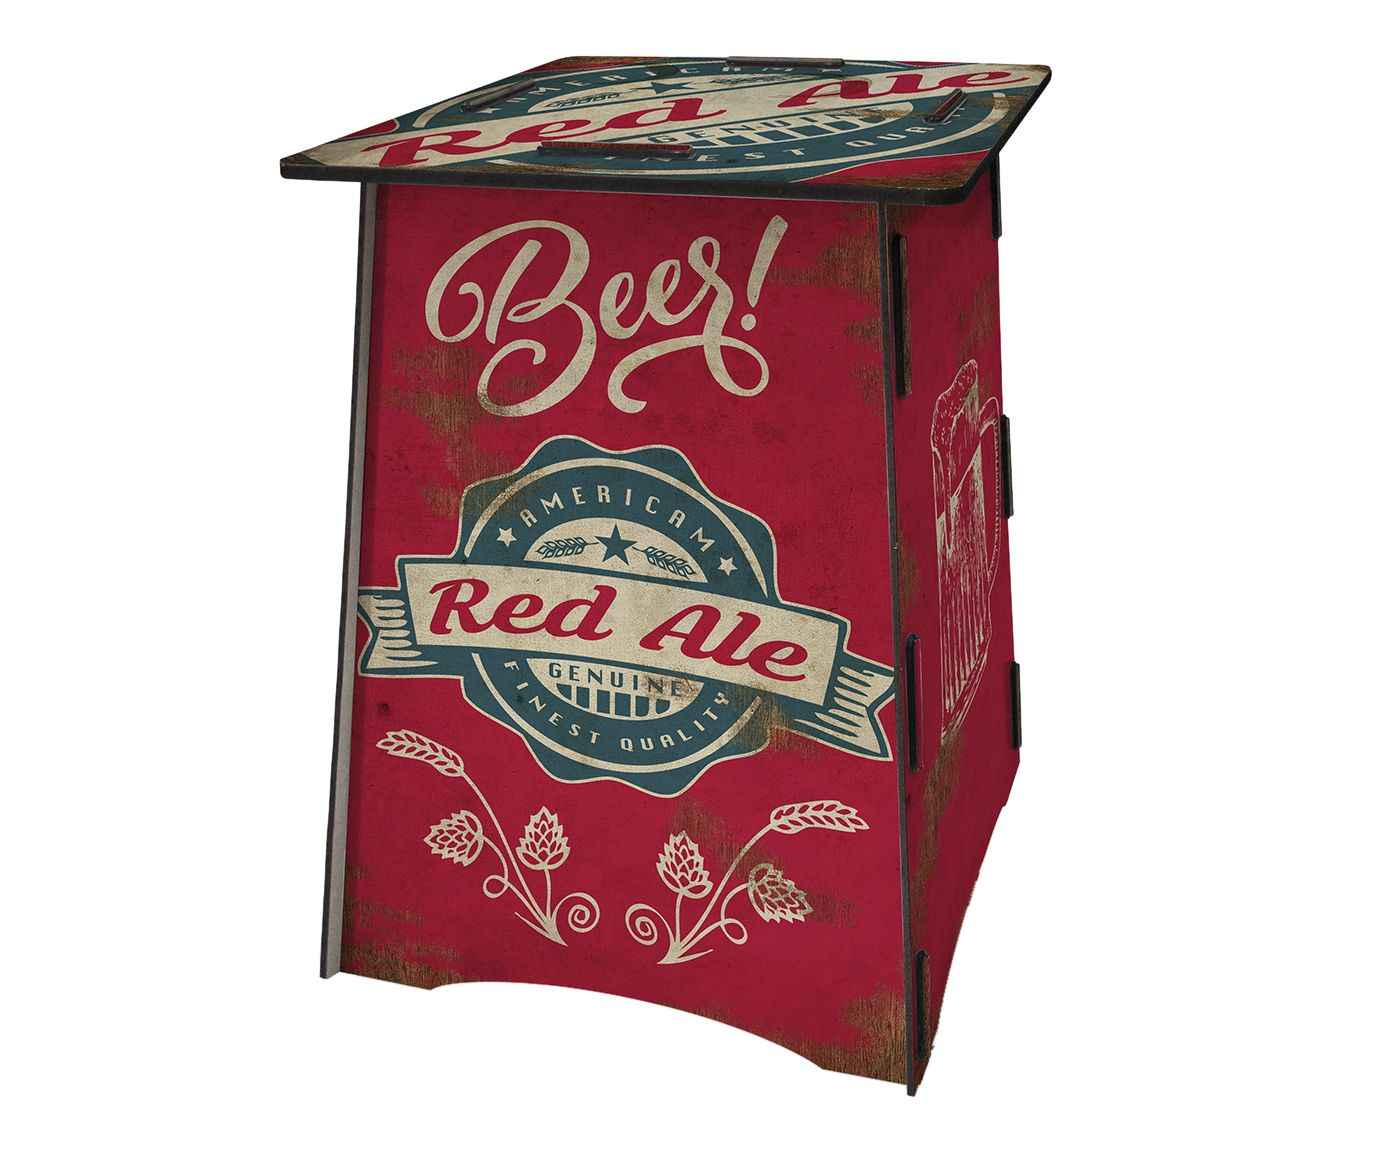 Banquinho Bipo Red Ale   Westwing.com.br